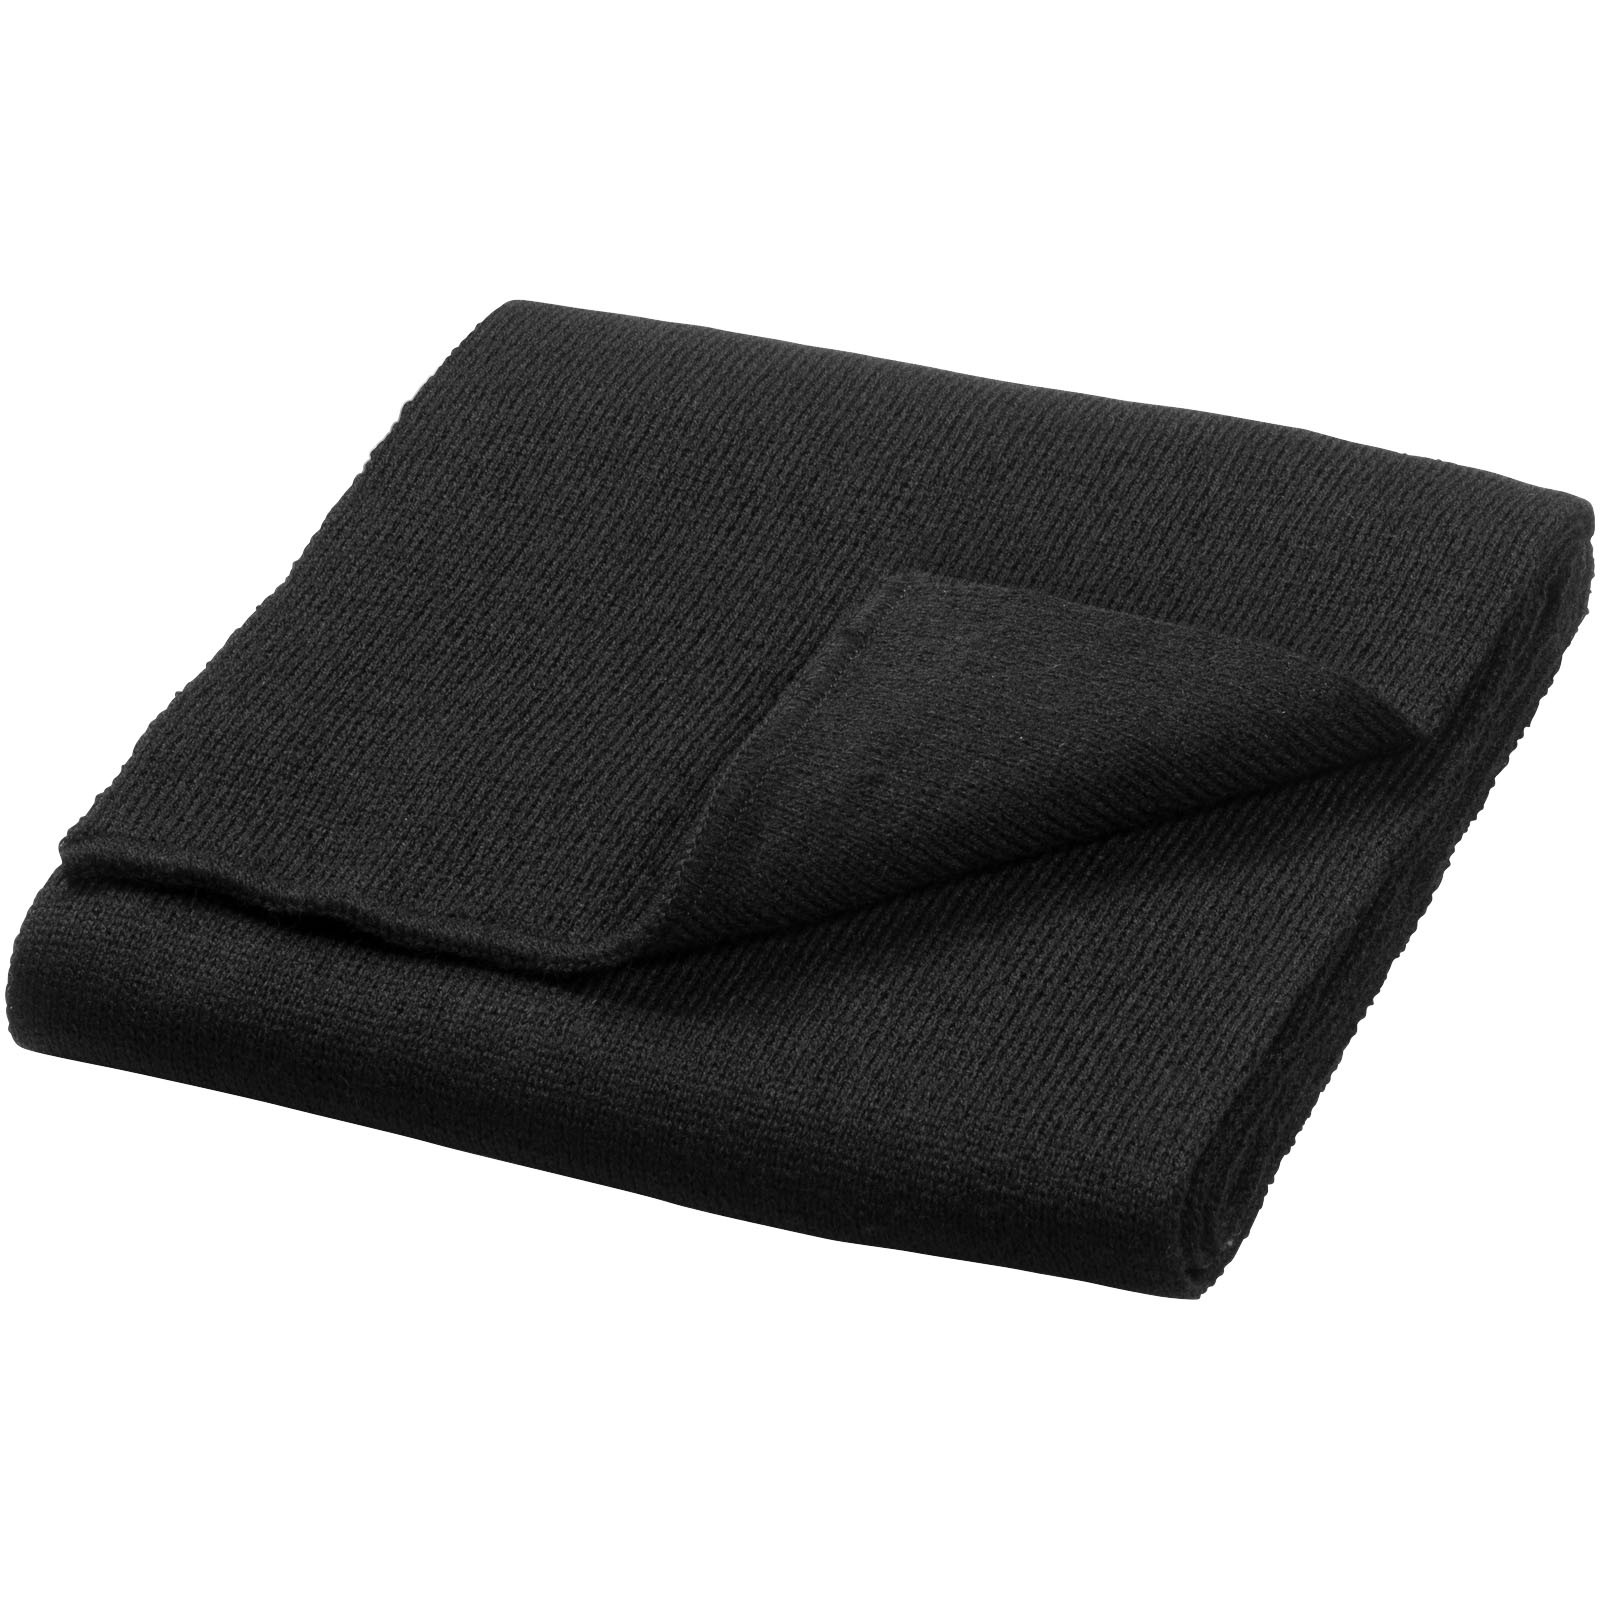 Columbus scarf - Solid black